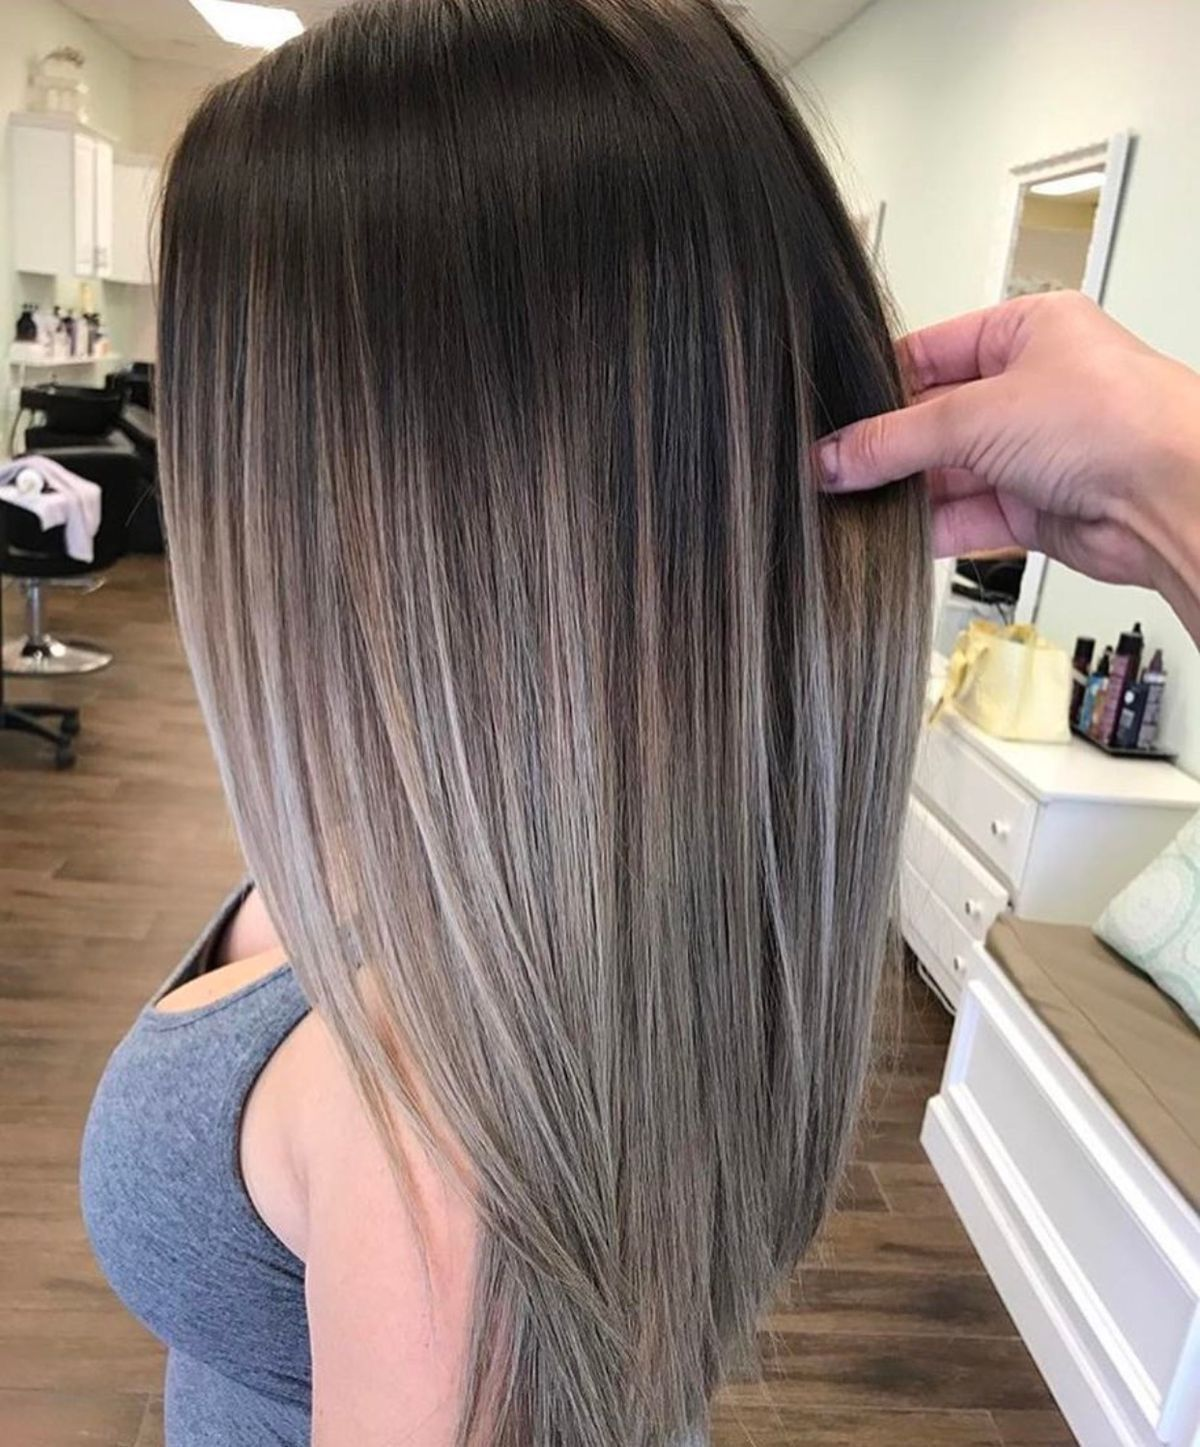 Pin By Maile Mountjoy On Hair Pinterest Hair Coloring Hair